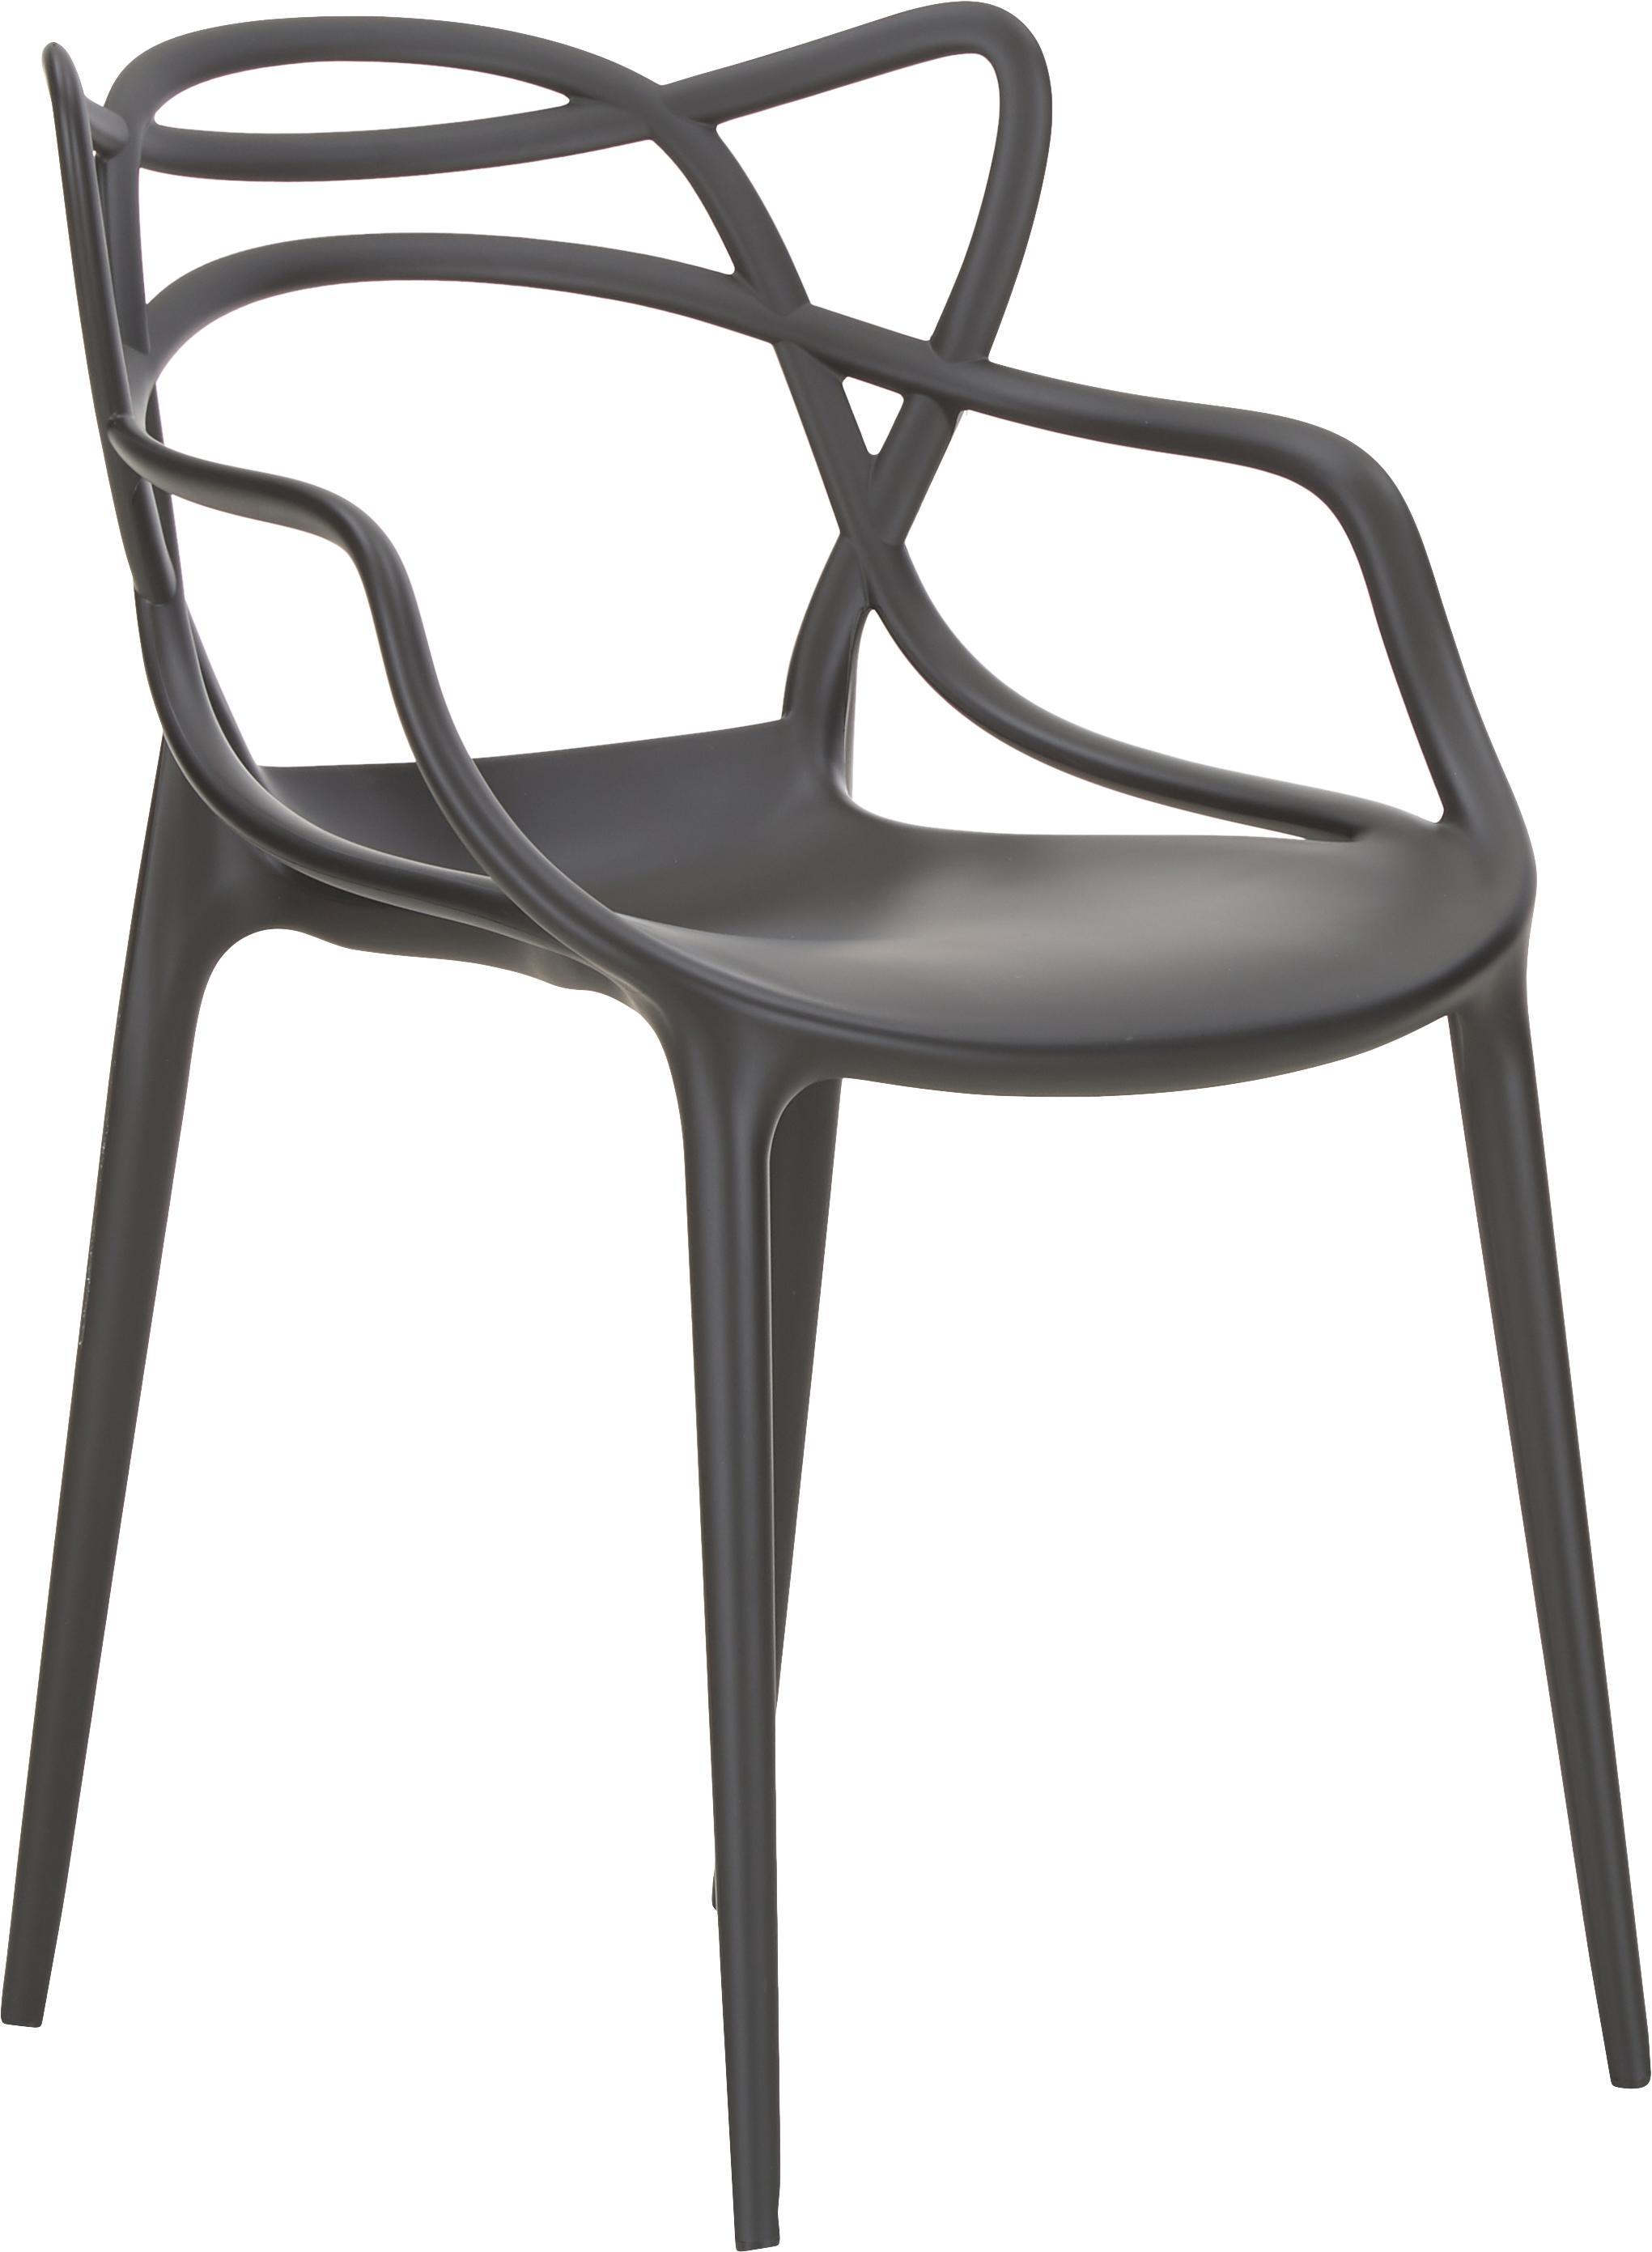 Sedia con braccioli Masters 2 pz, Polipropilene, Nero, Larg. 57 x Alt. 84 cm